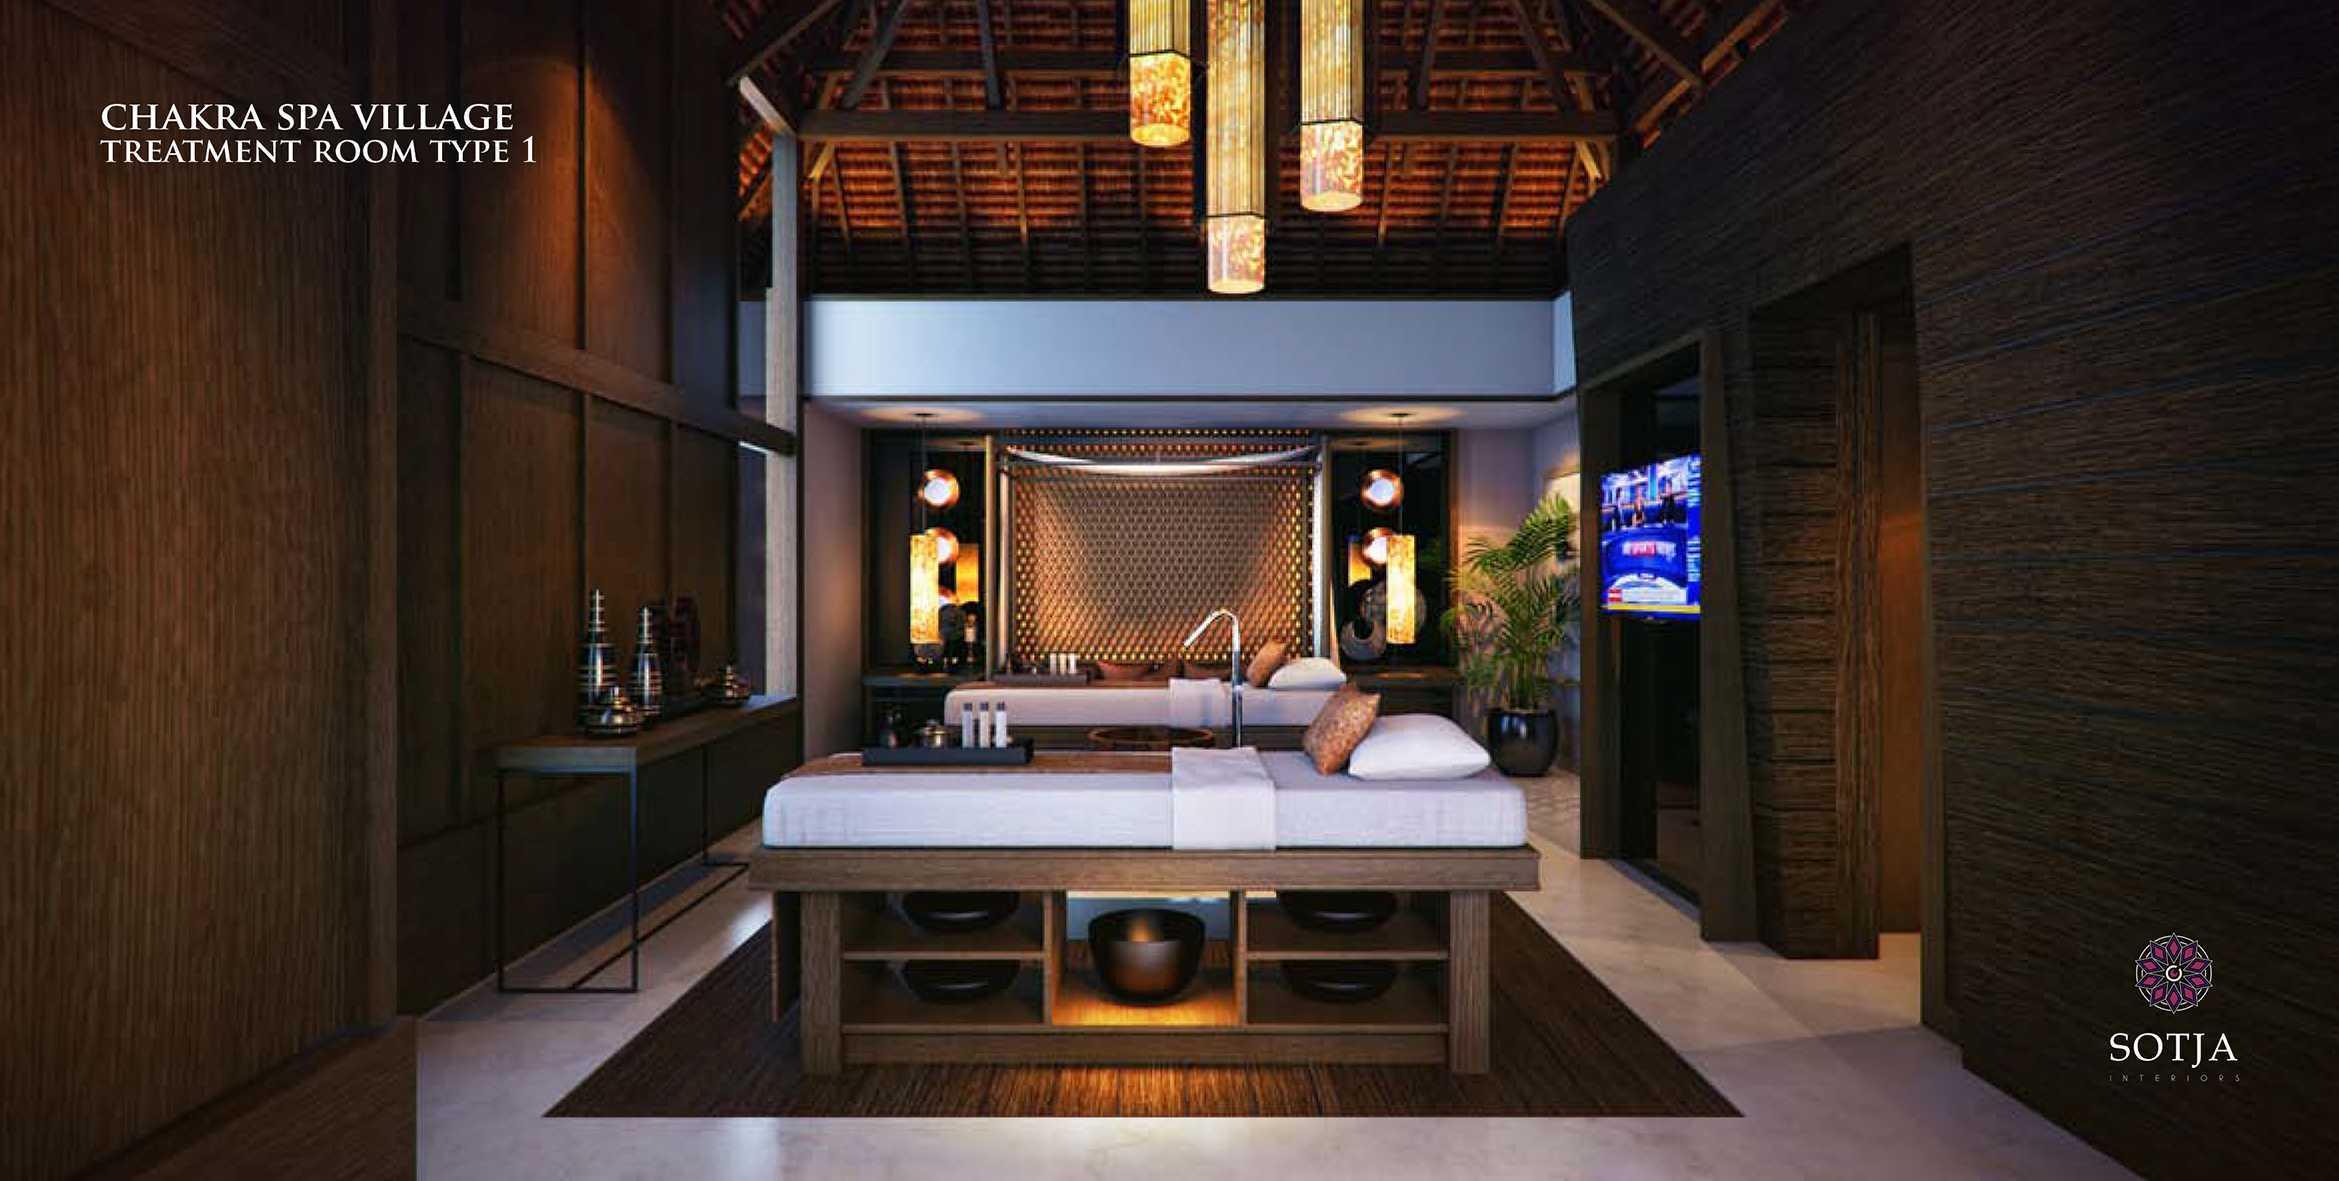 Sotja Interiors Chakra Spa Village At Batam Riau, Indonesia Riau, Indonesia Treatment-Room-Type-1B   9920